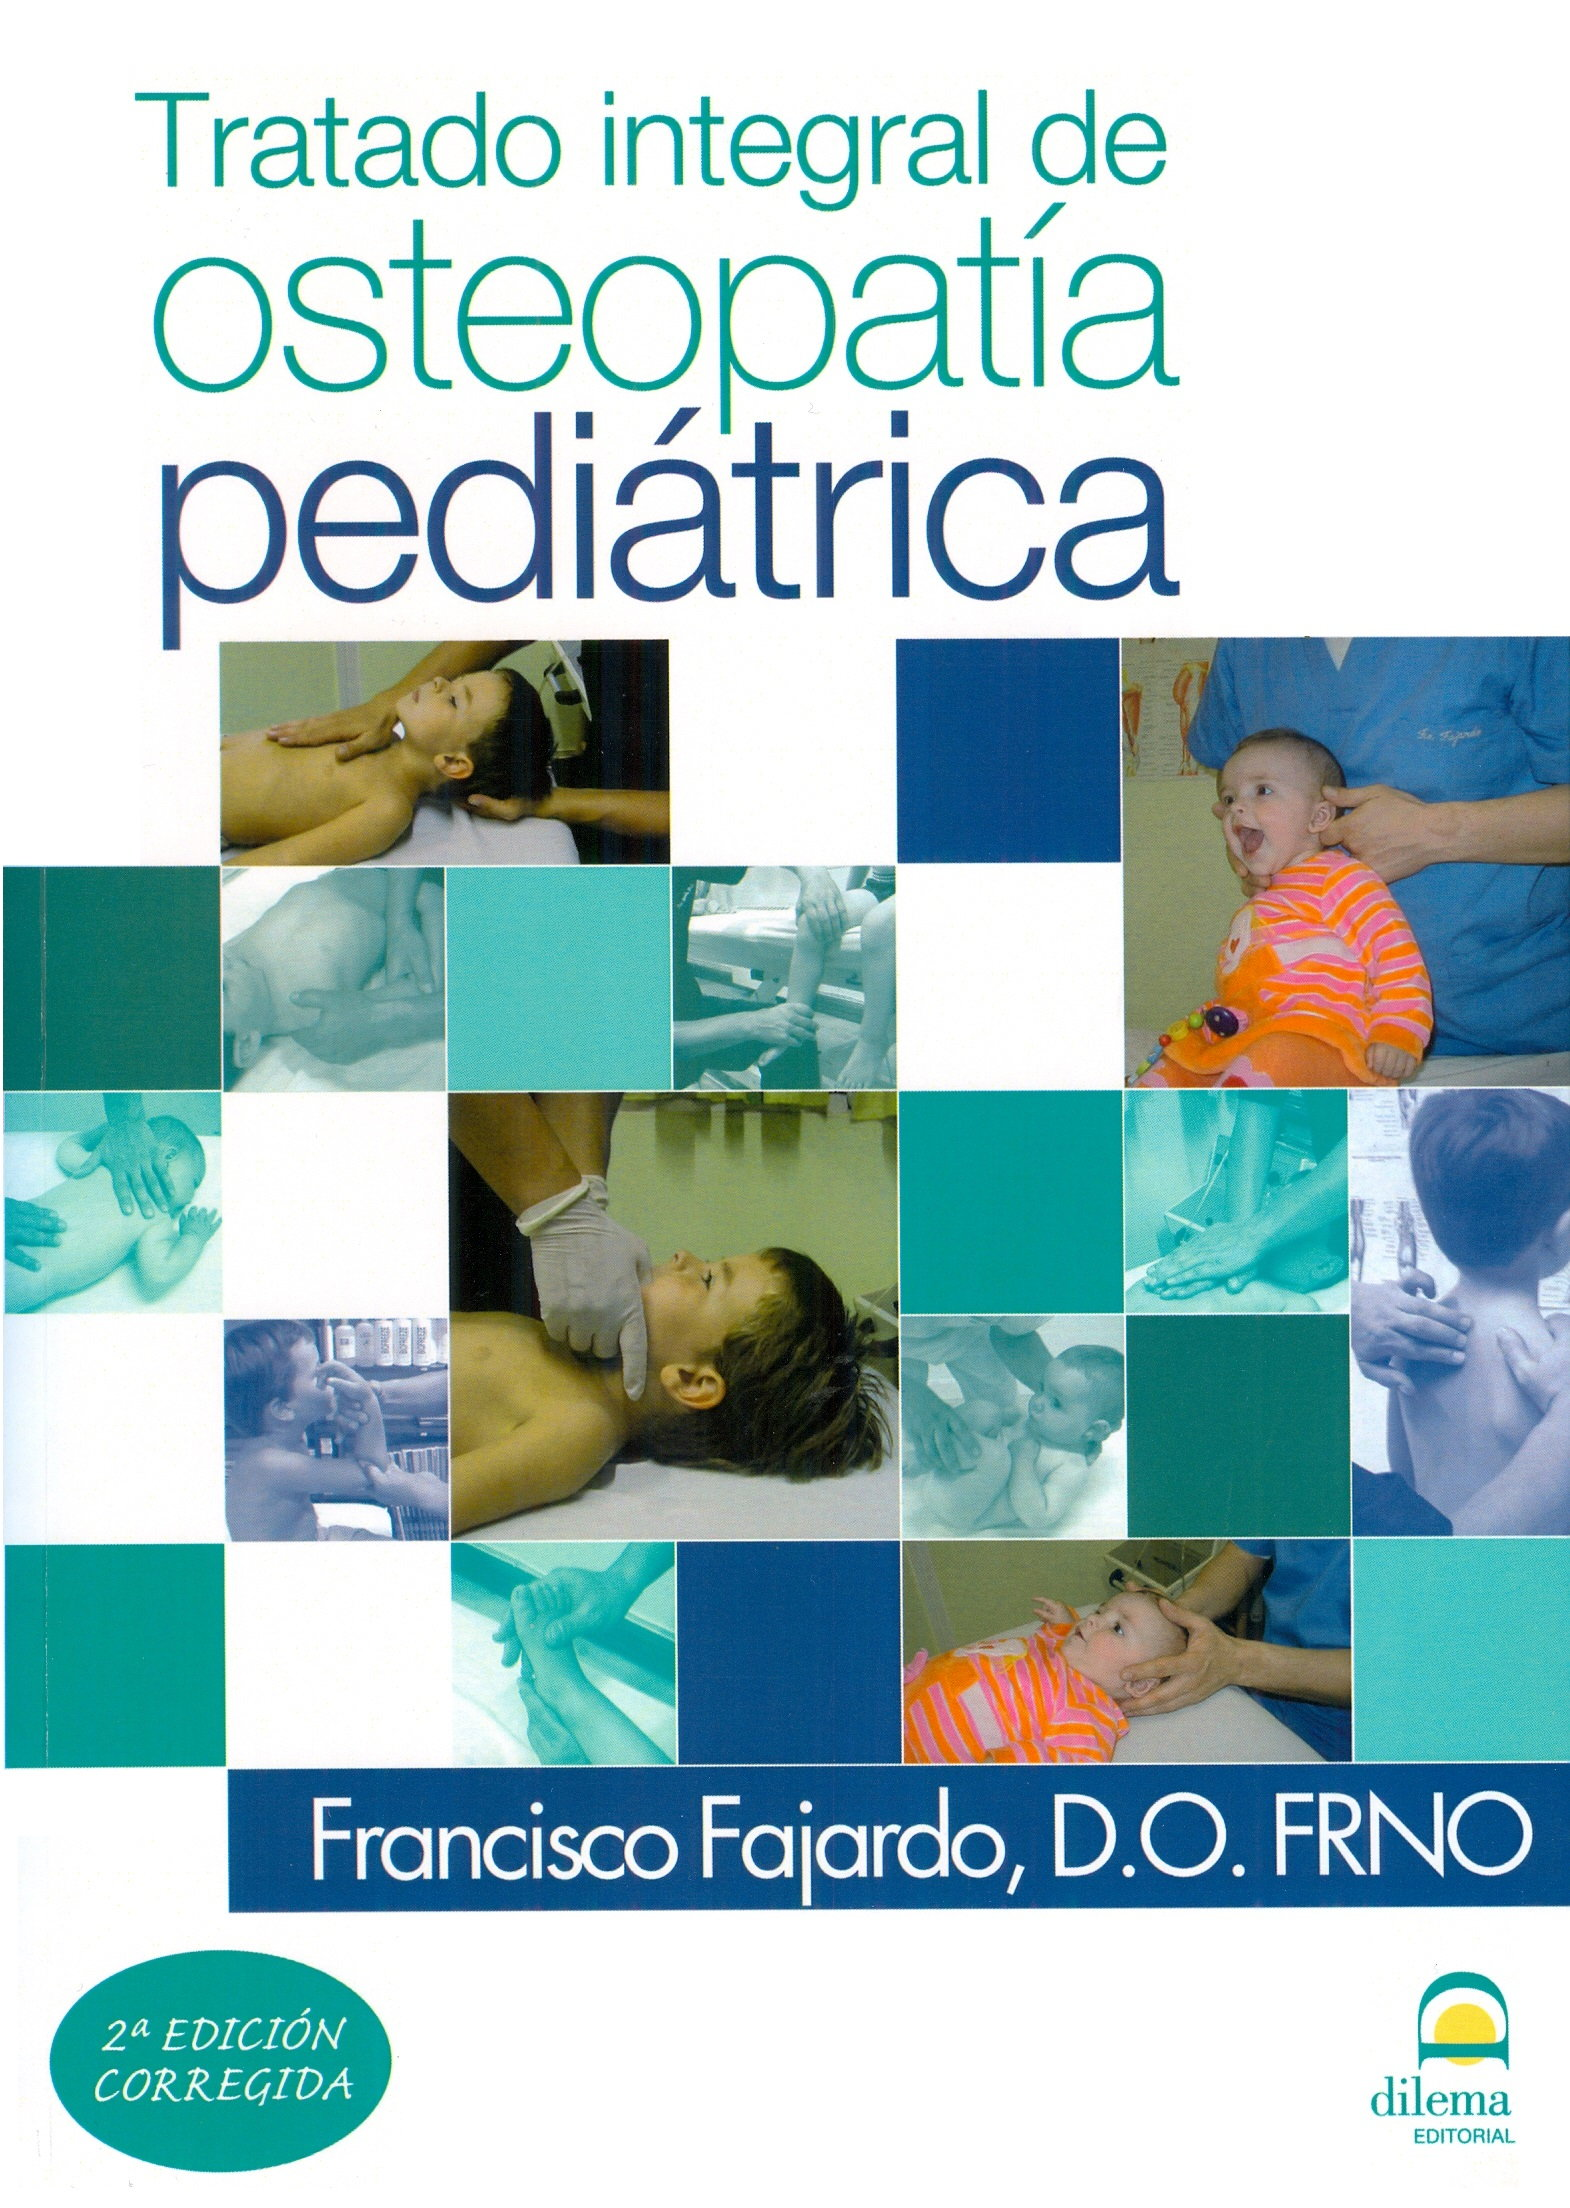 Tratado integral de osteopatía pediátrica Image